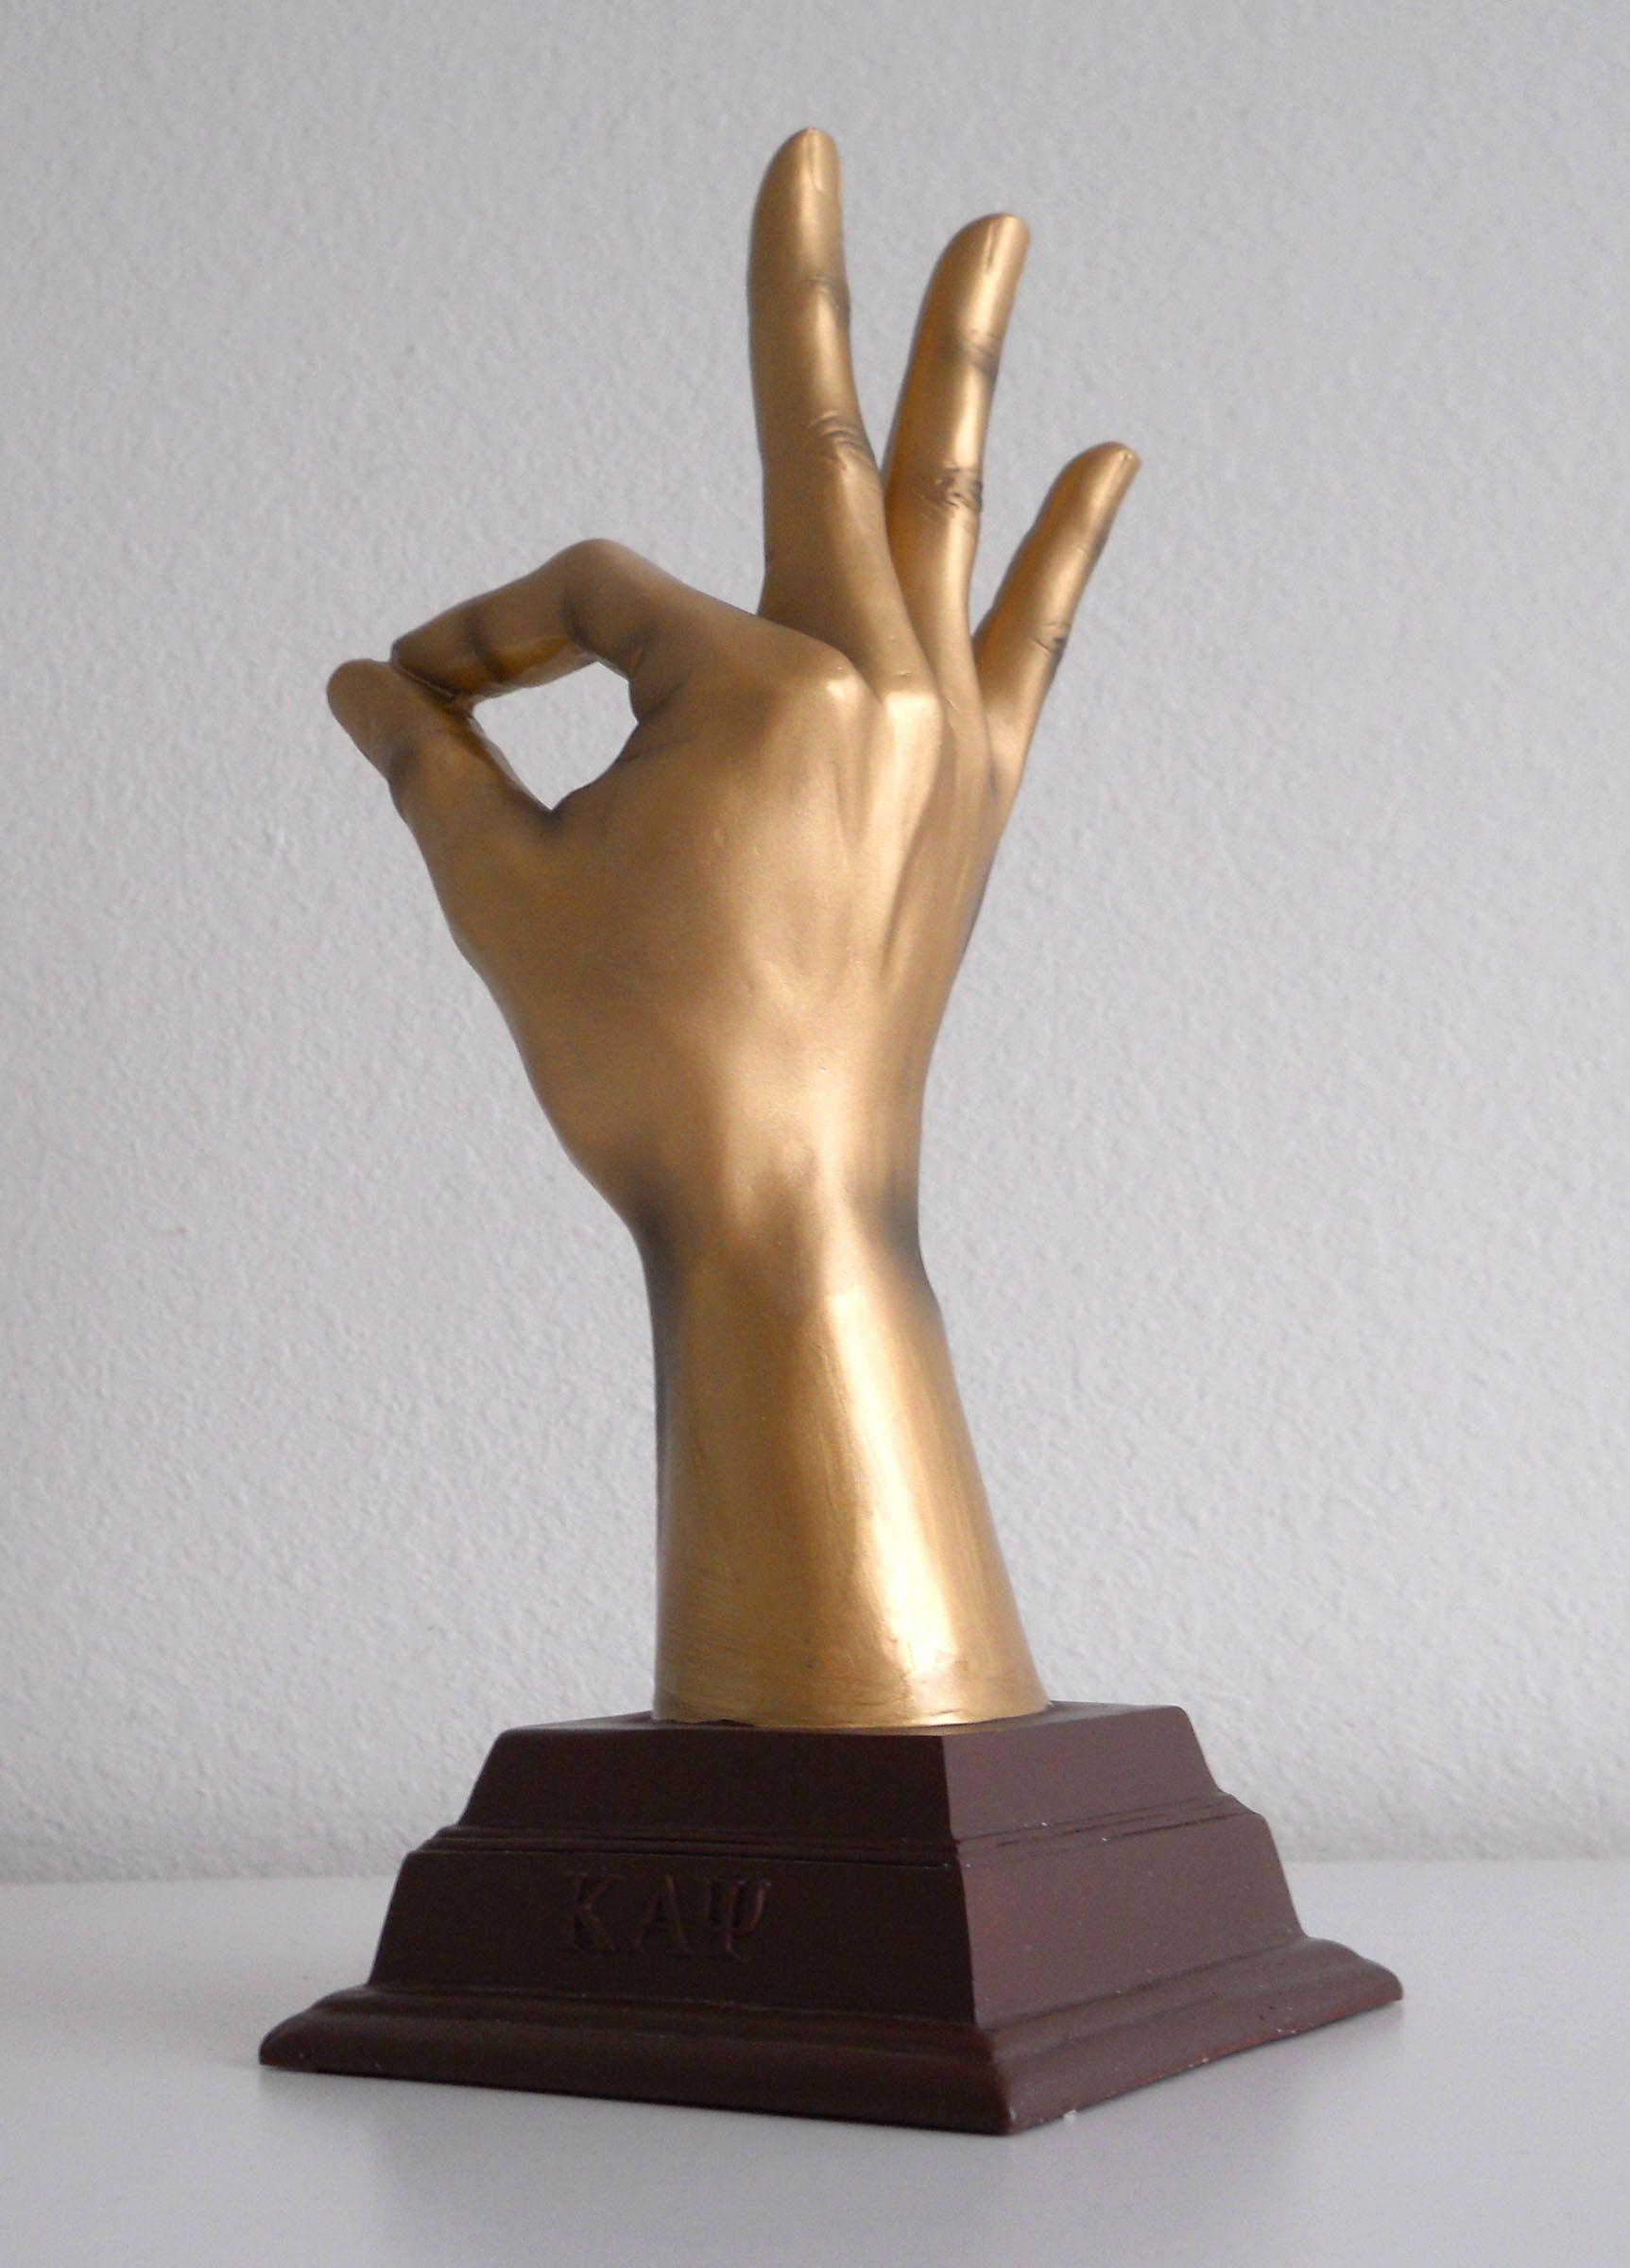 The hand yo kappa alpha psi sculpture thumbnail 1 kappa the hand yo kappa alpha psi sculpture thumbnail 1 buycottarizona Images